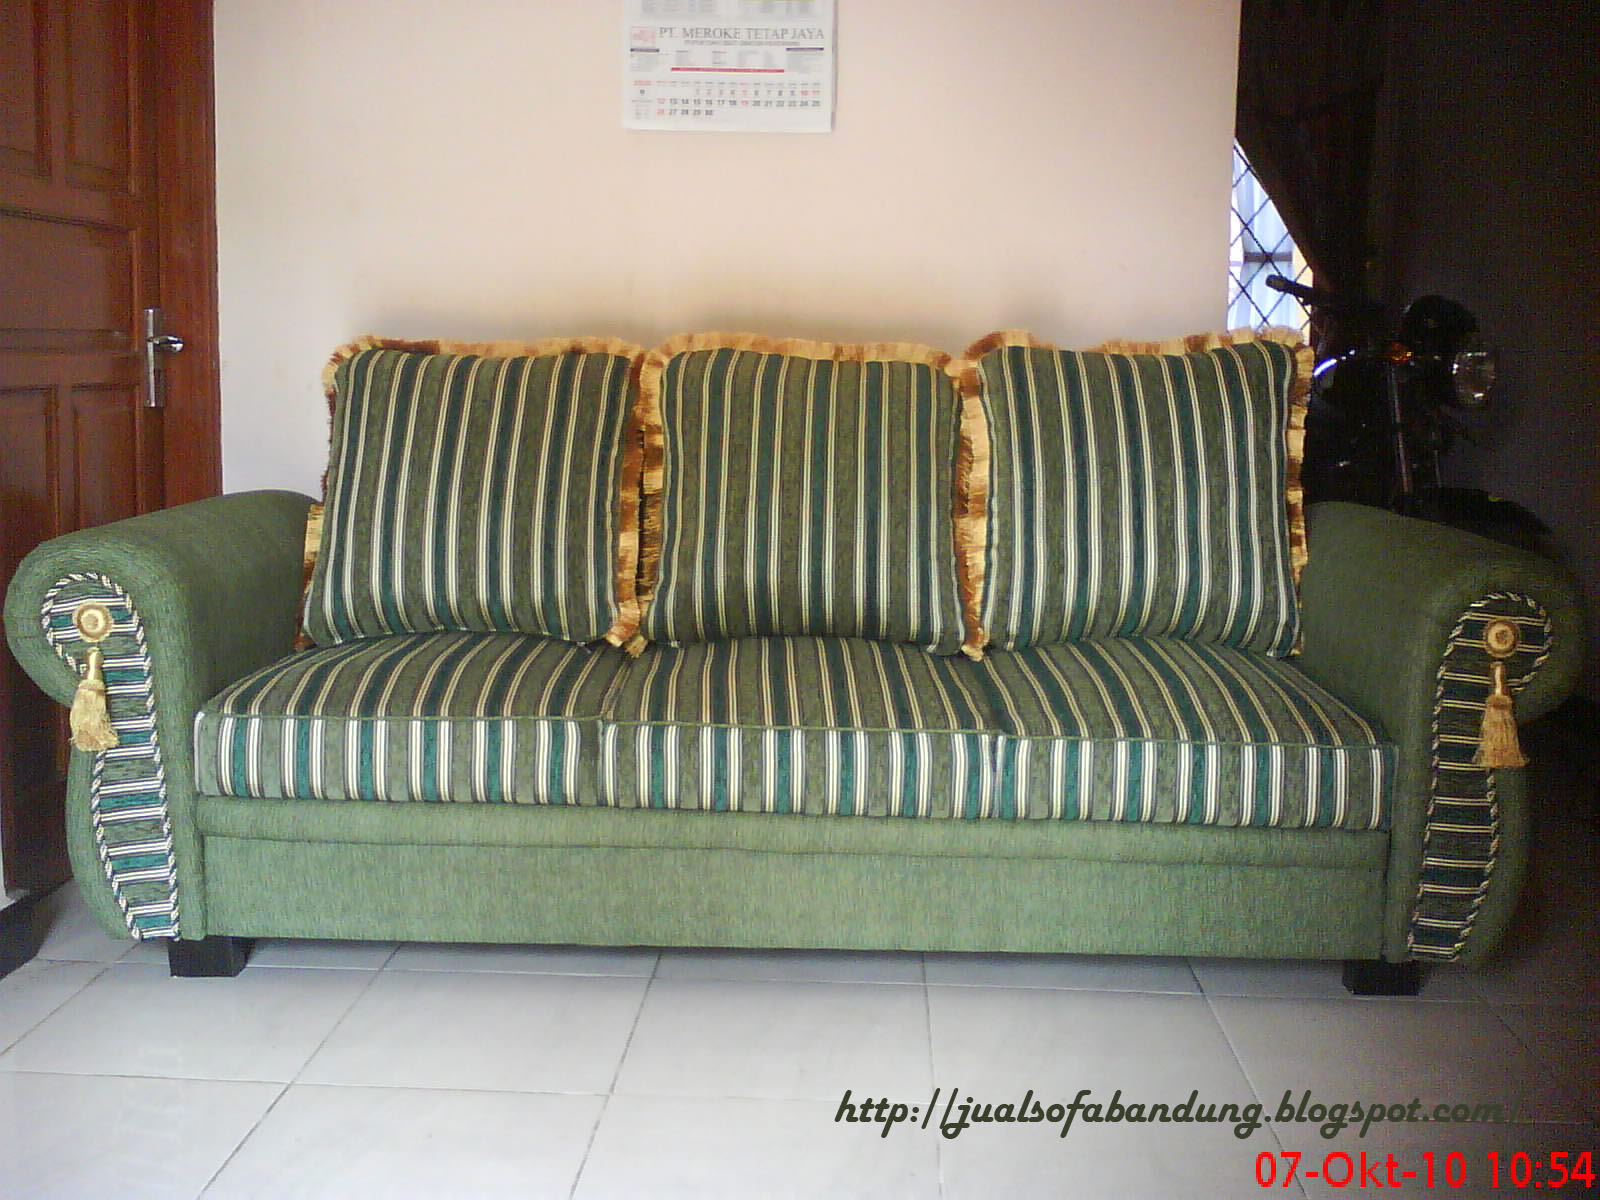 Jual Sofa Bed Murah Di Jakarta Selatan Awesome Beds Bandung Hp 0896